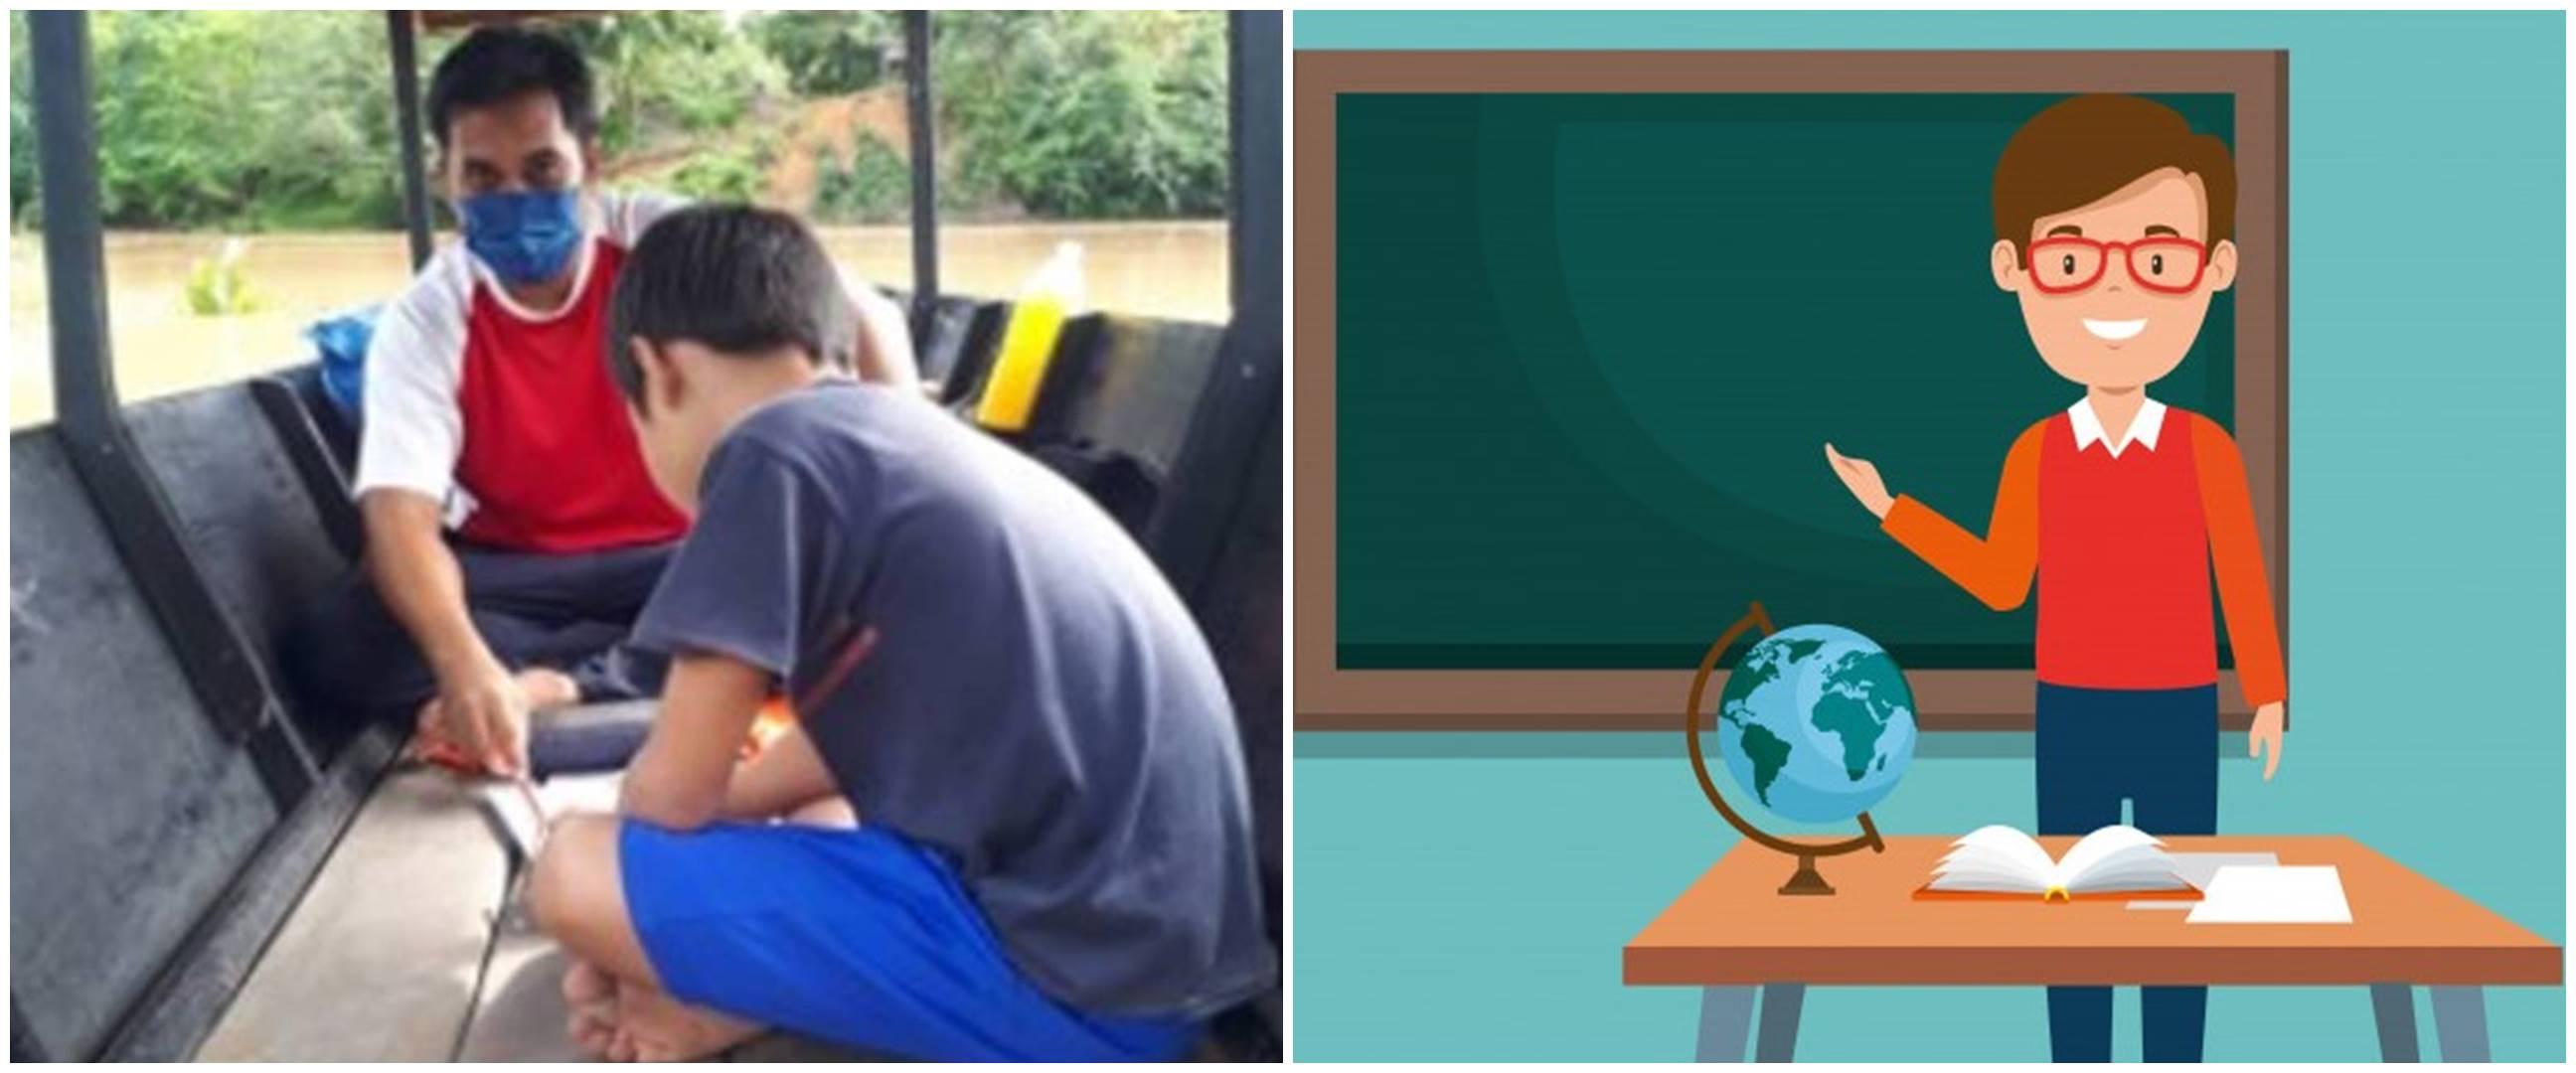 Minim akses internet, guru ini gunakan perahu untuk tempat mengajar